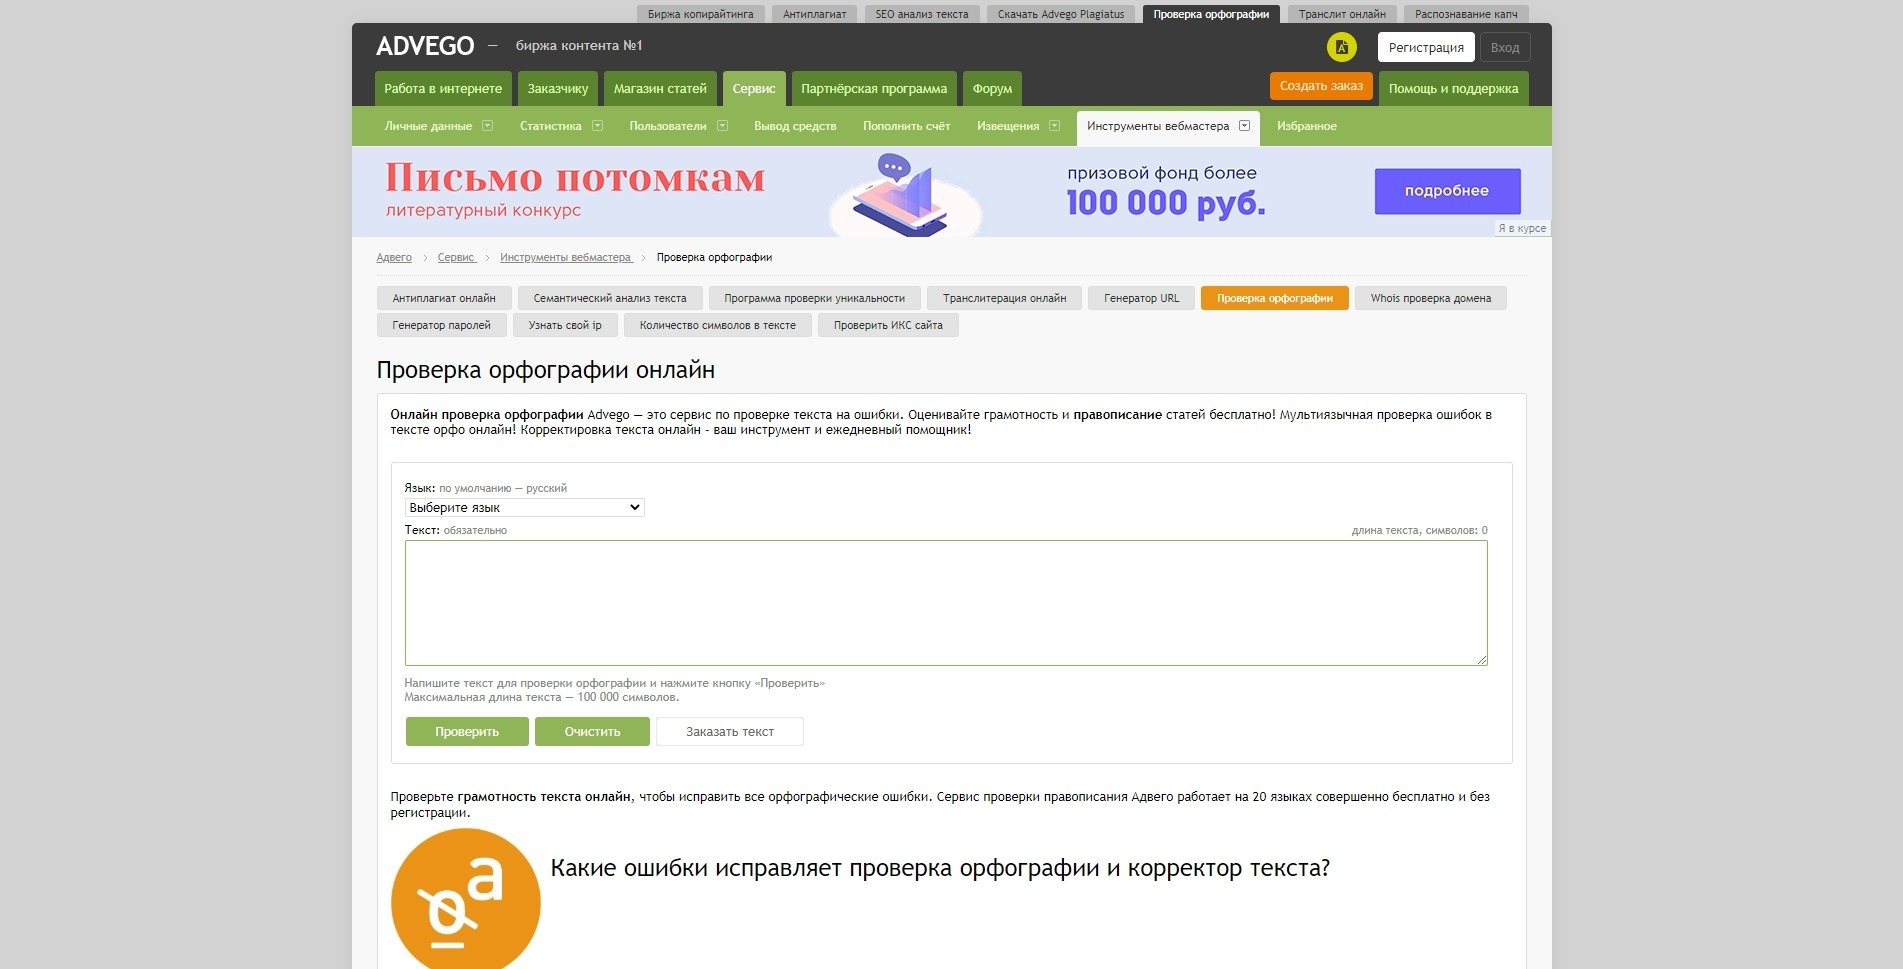 Проверка пунктуации онлайн: Advego